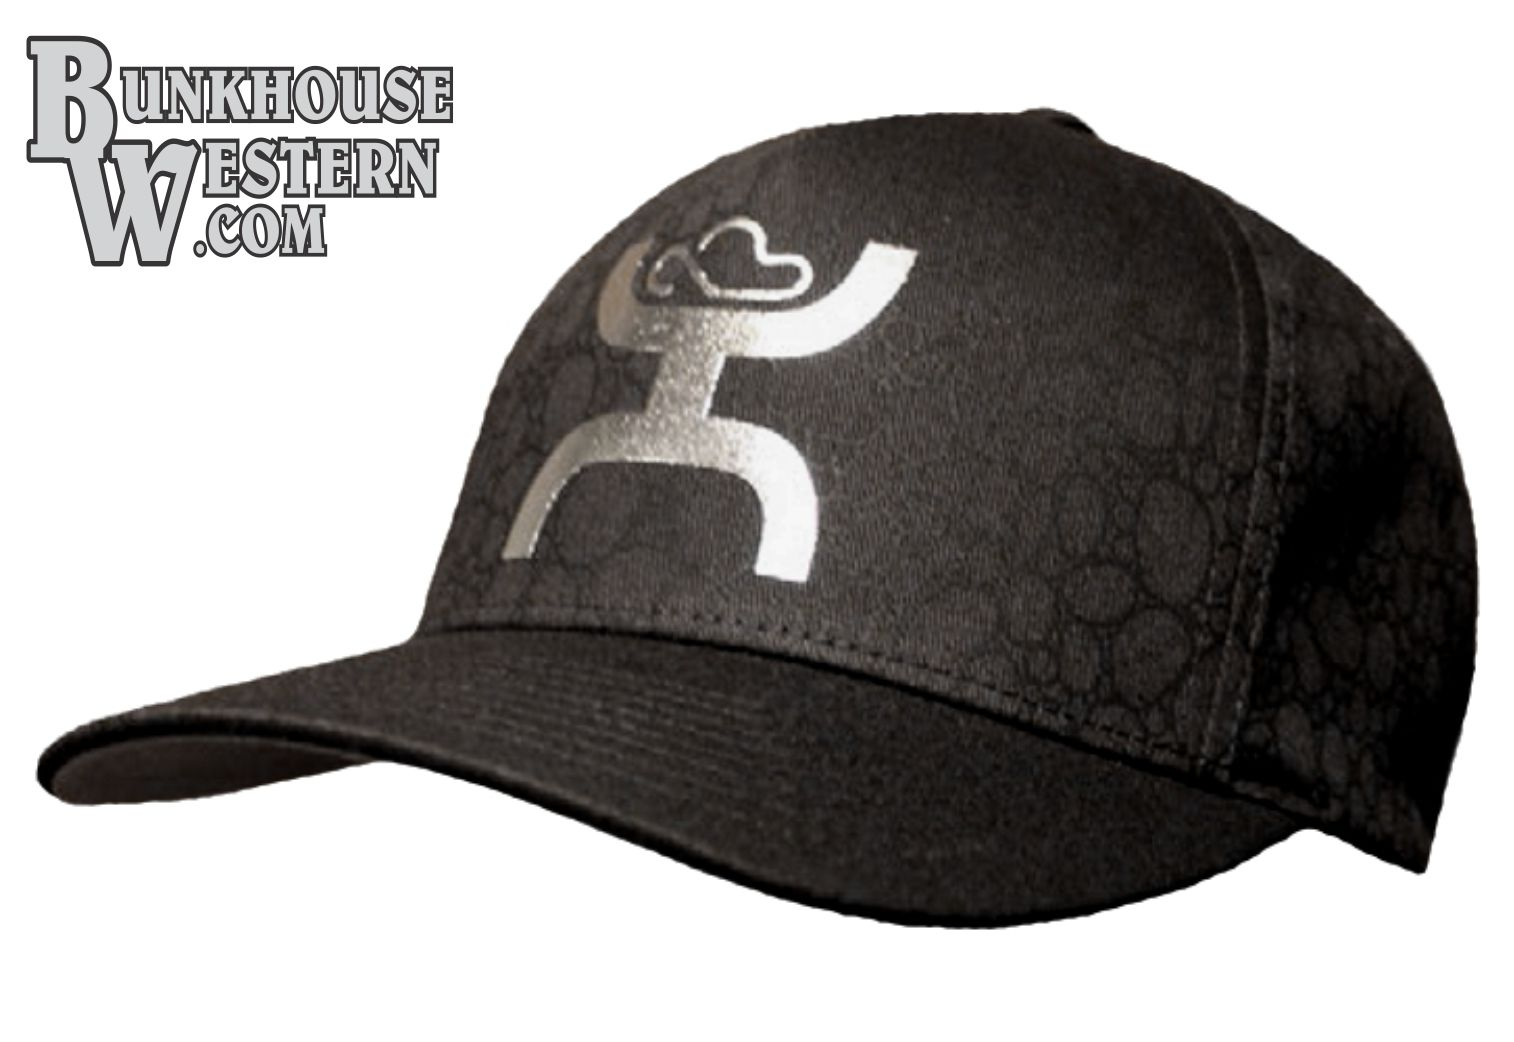 check out 855d1 bfe1b ... sale hooey bullet metallic silver flexfit cap get your hooey rodeo  cowboy d7130 88403